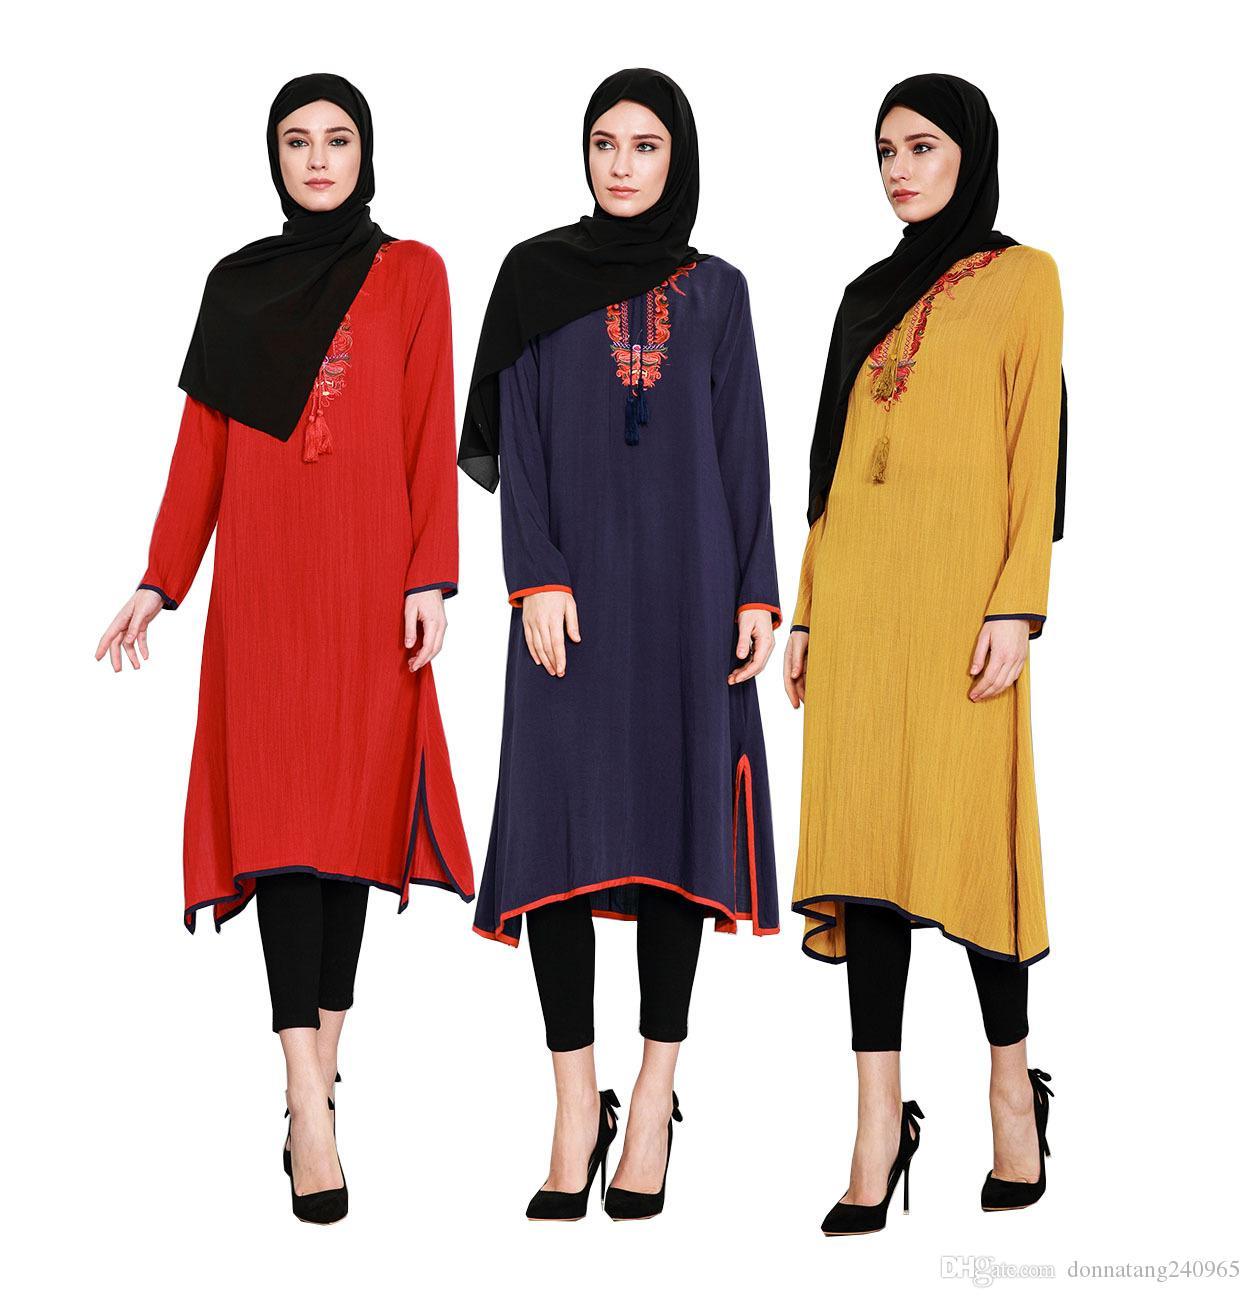 Compre Largas Musulmanes Bordado Malasia Camisas Escote Irregular rvYOrwqR